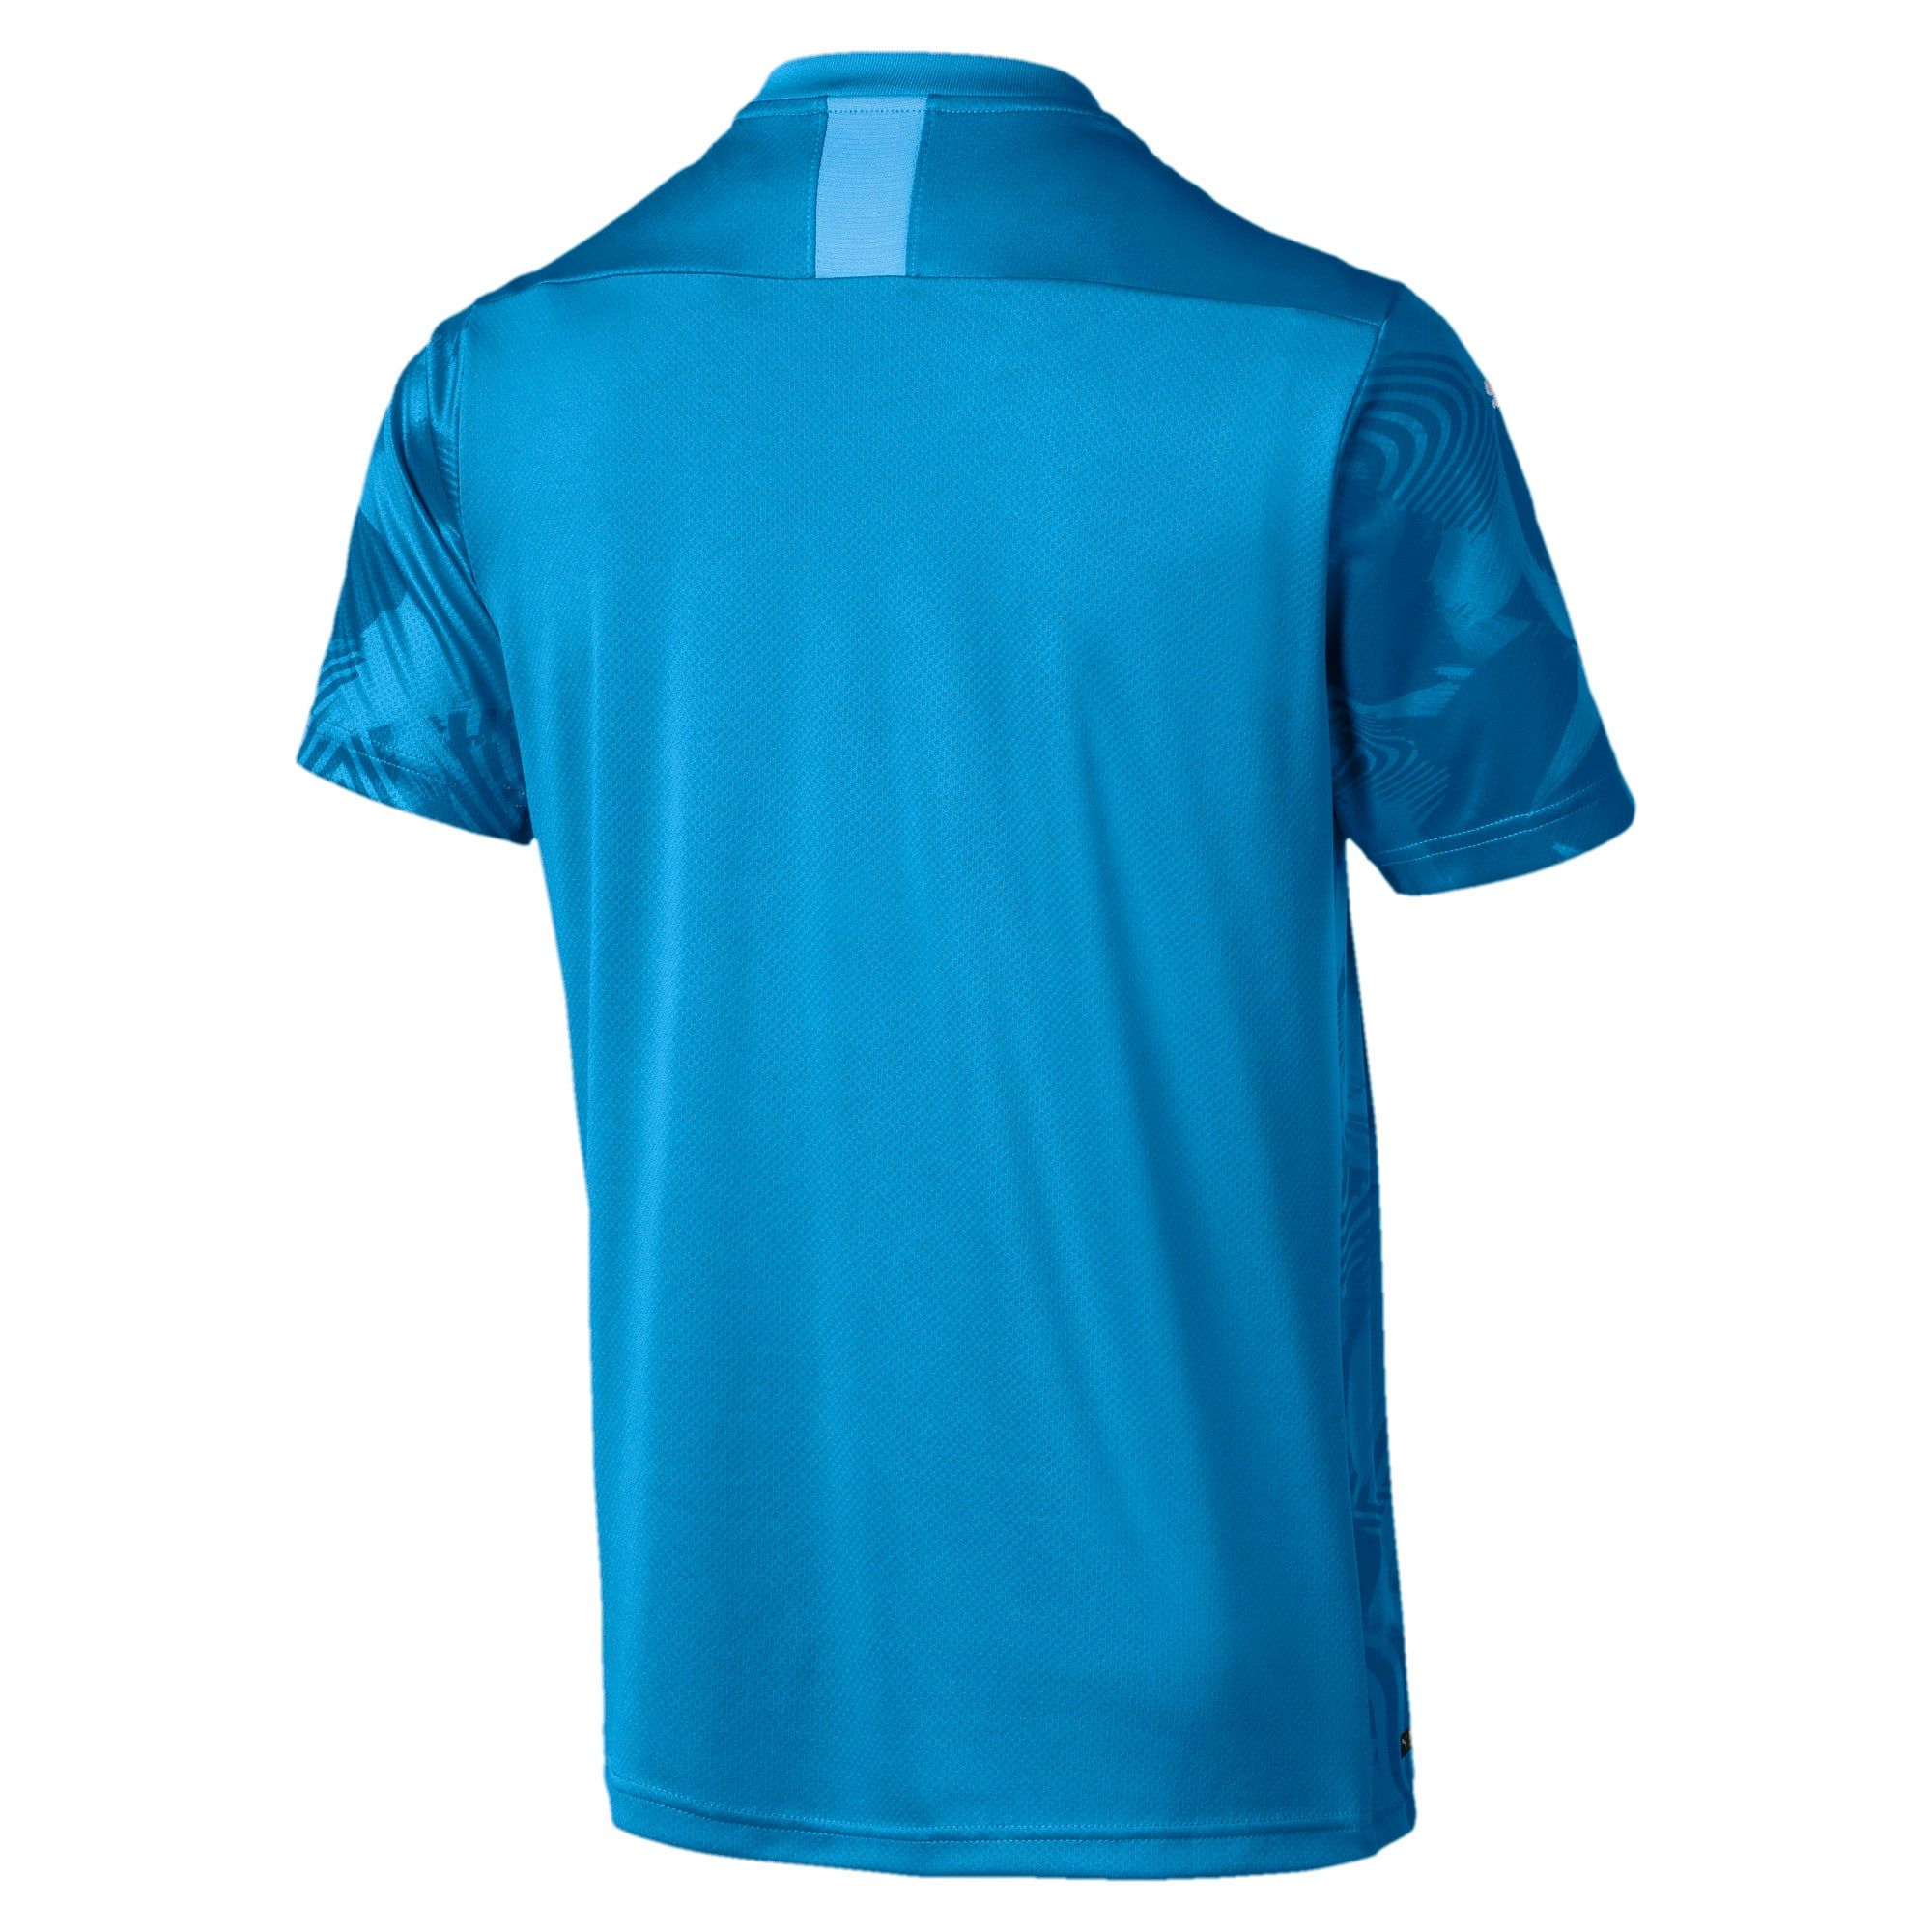 Thumbnail 2 of Valencia CF Third Replica Men's Shirt, Bleu Azur-Indigo Bunting, medium